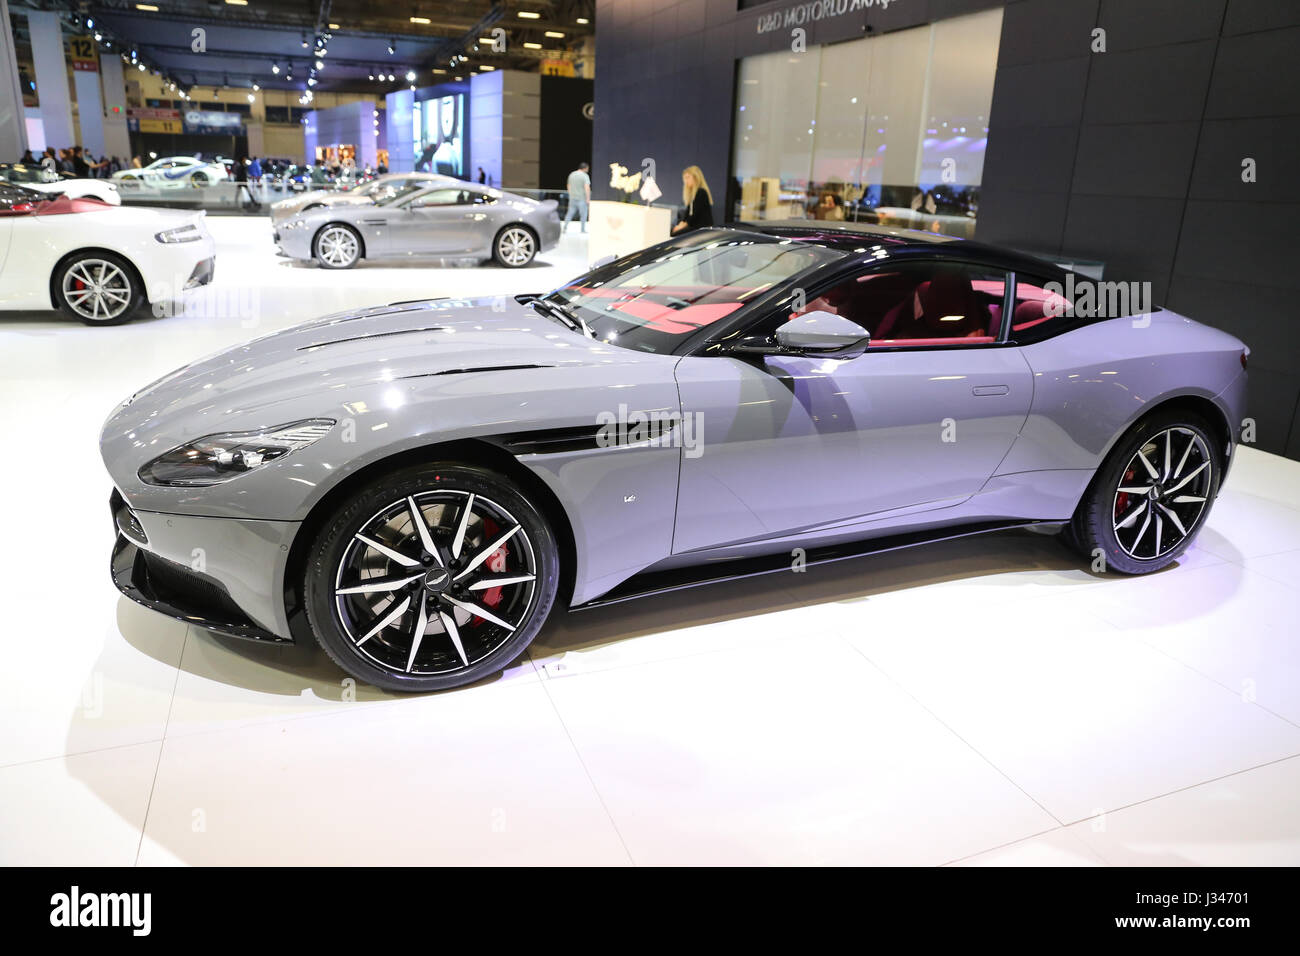 ISTANBUL, TURKEY - APRIL 22, 2017: Aston Martin DB11 on display at Autoshow Istanbul - Stock Image